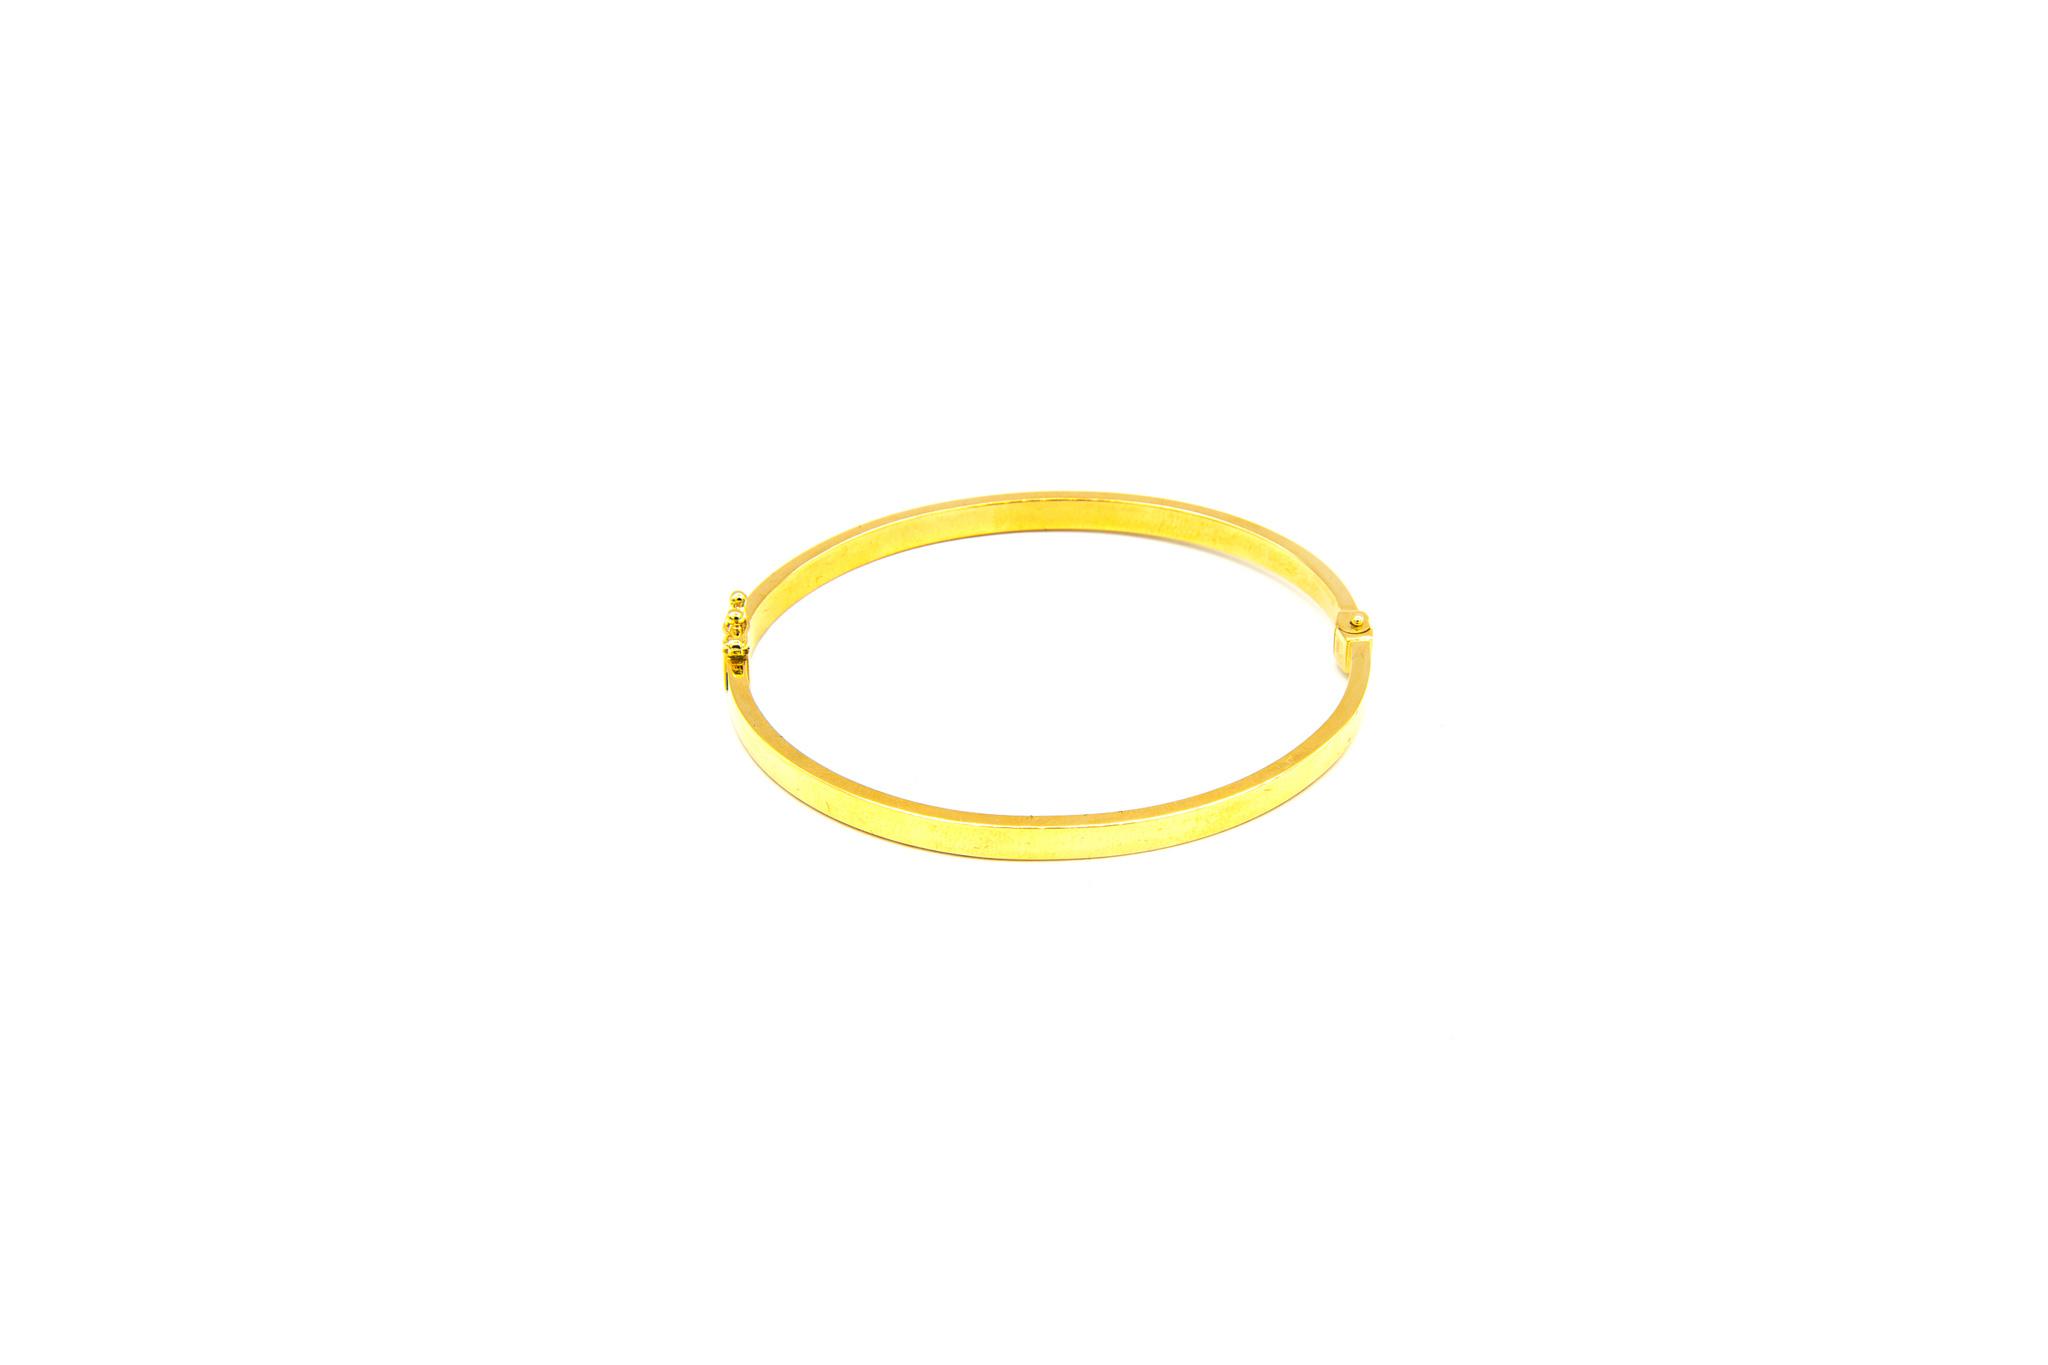 Armband vast gescherpte afwerking-1